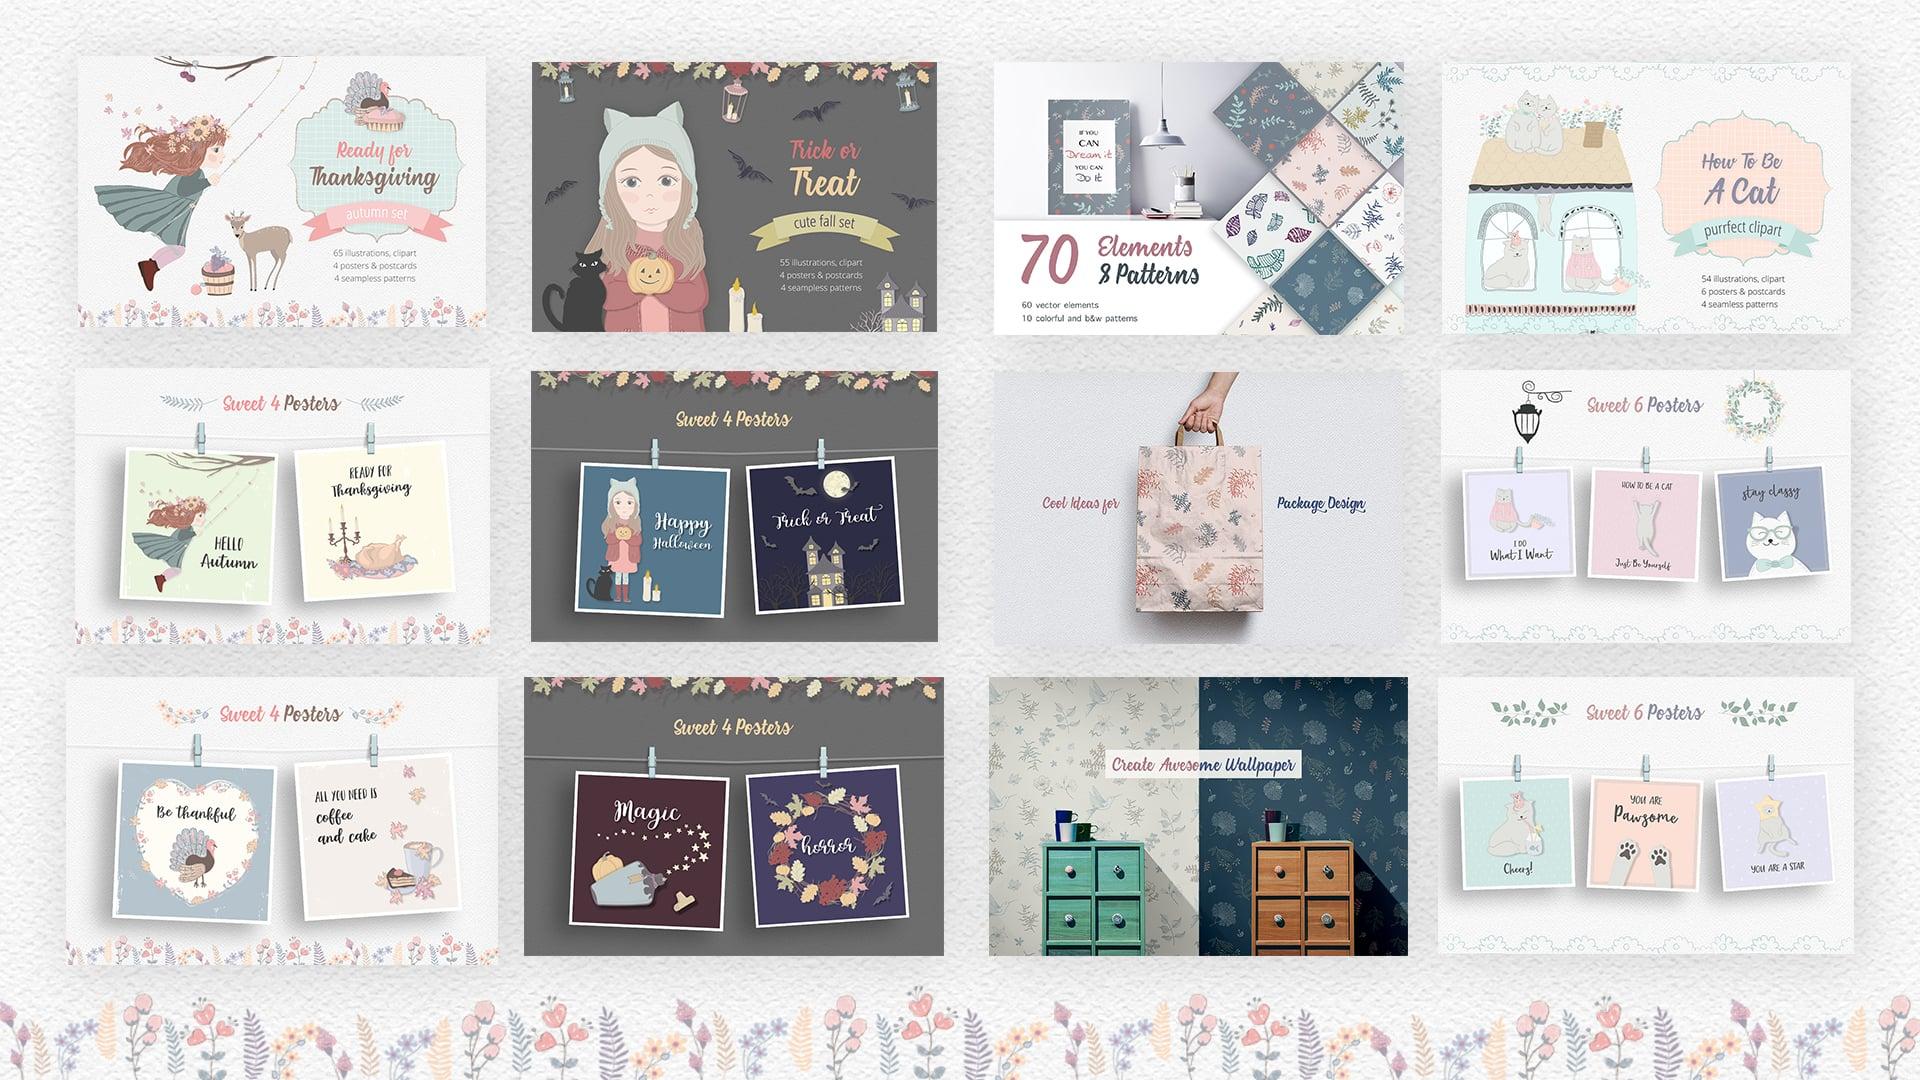 70+ Best Fall & Autumn Clip Art Collection in 2020 - autumn bundle 3